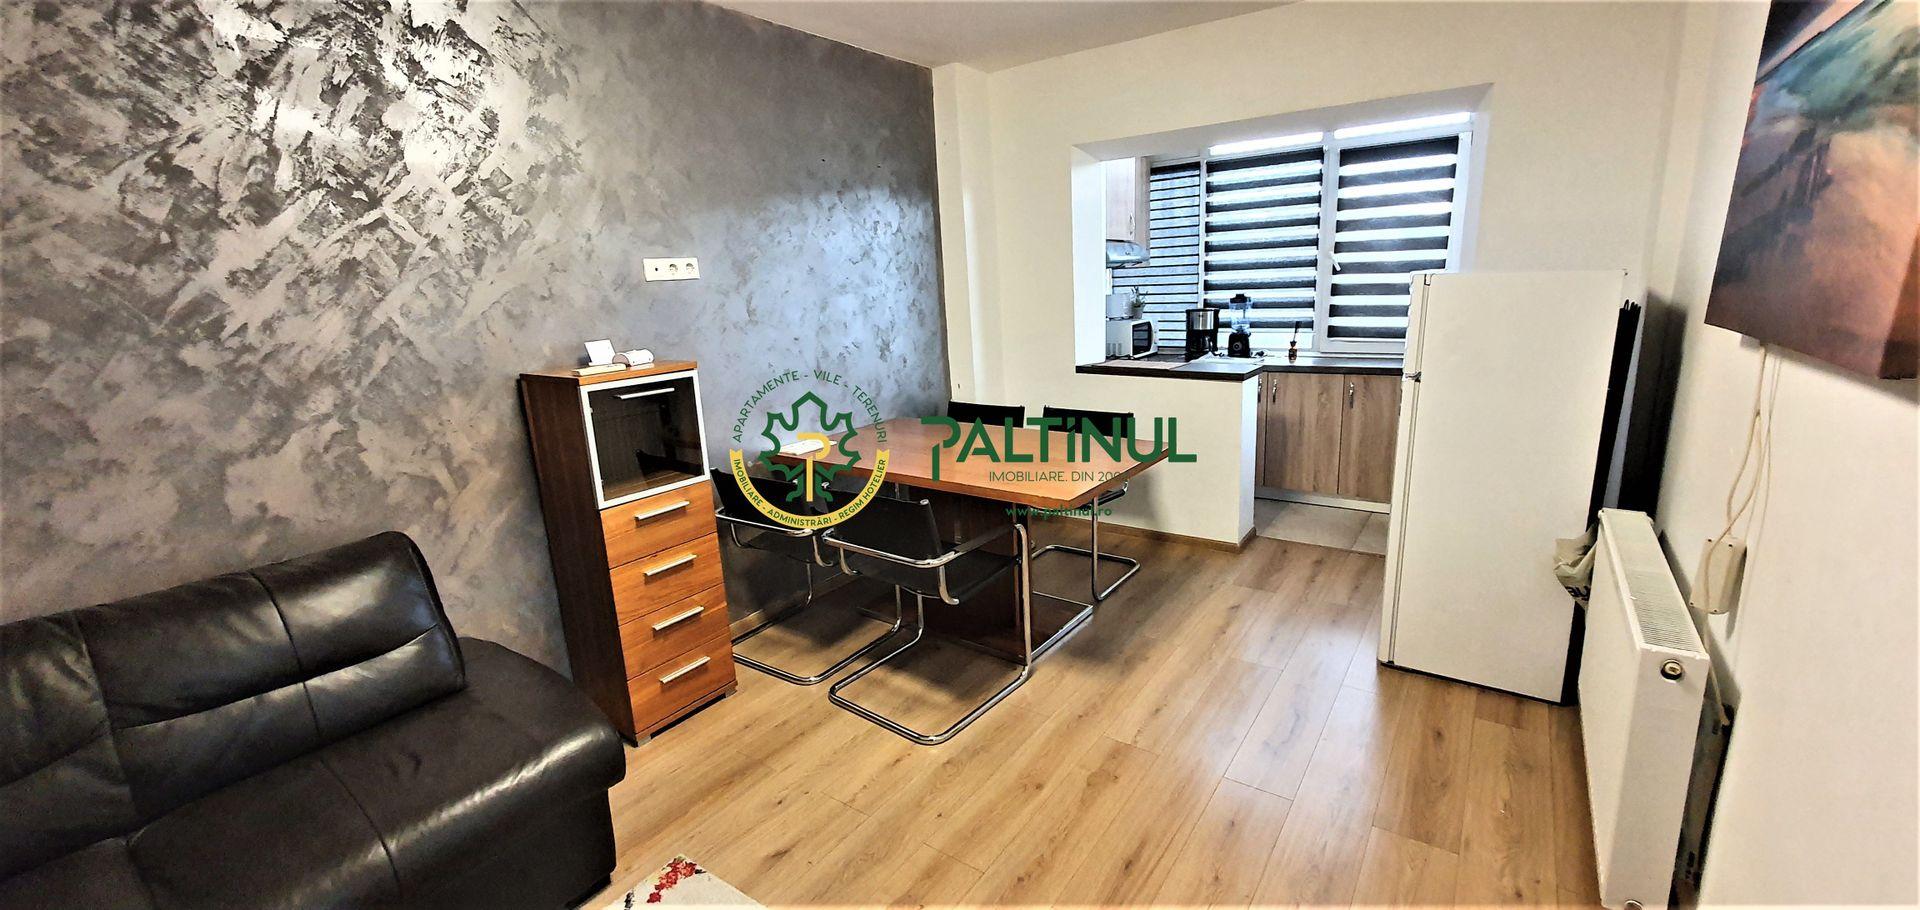 Apartament cu 3 camere de închiriat   Bld. Mihai Viteazul